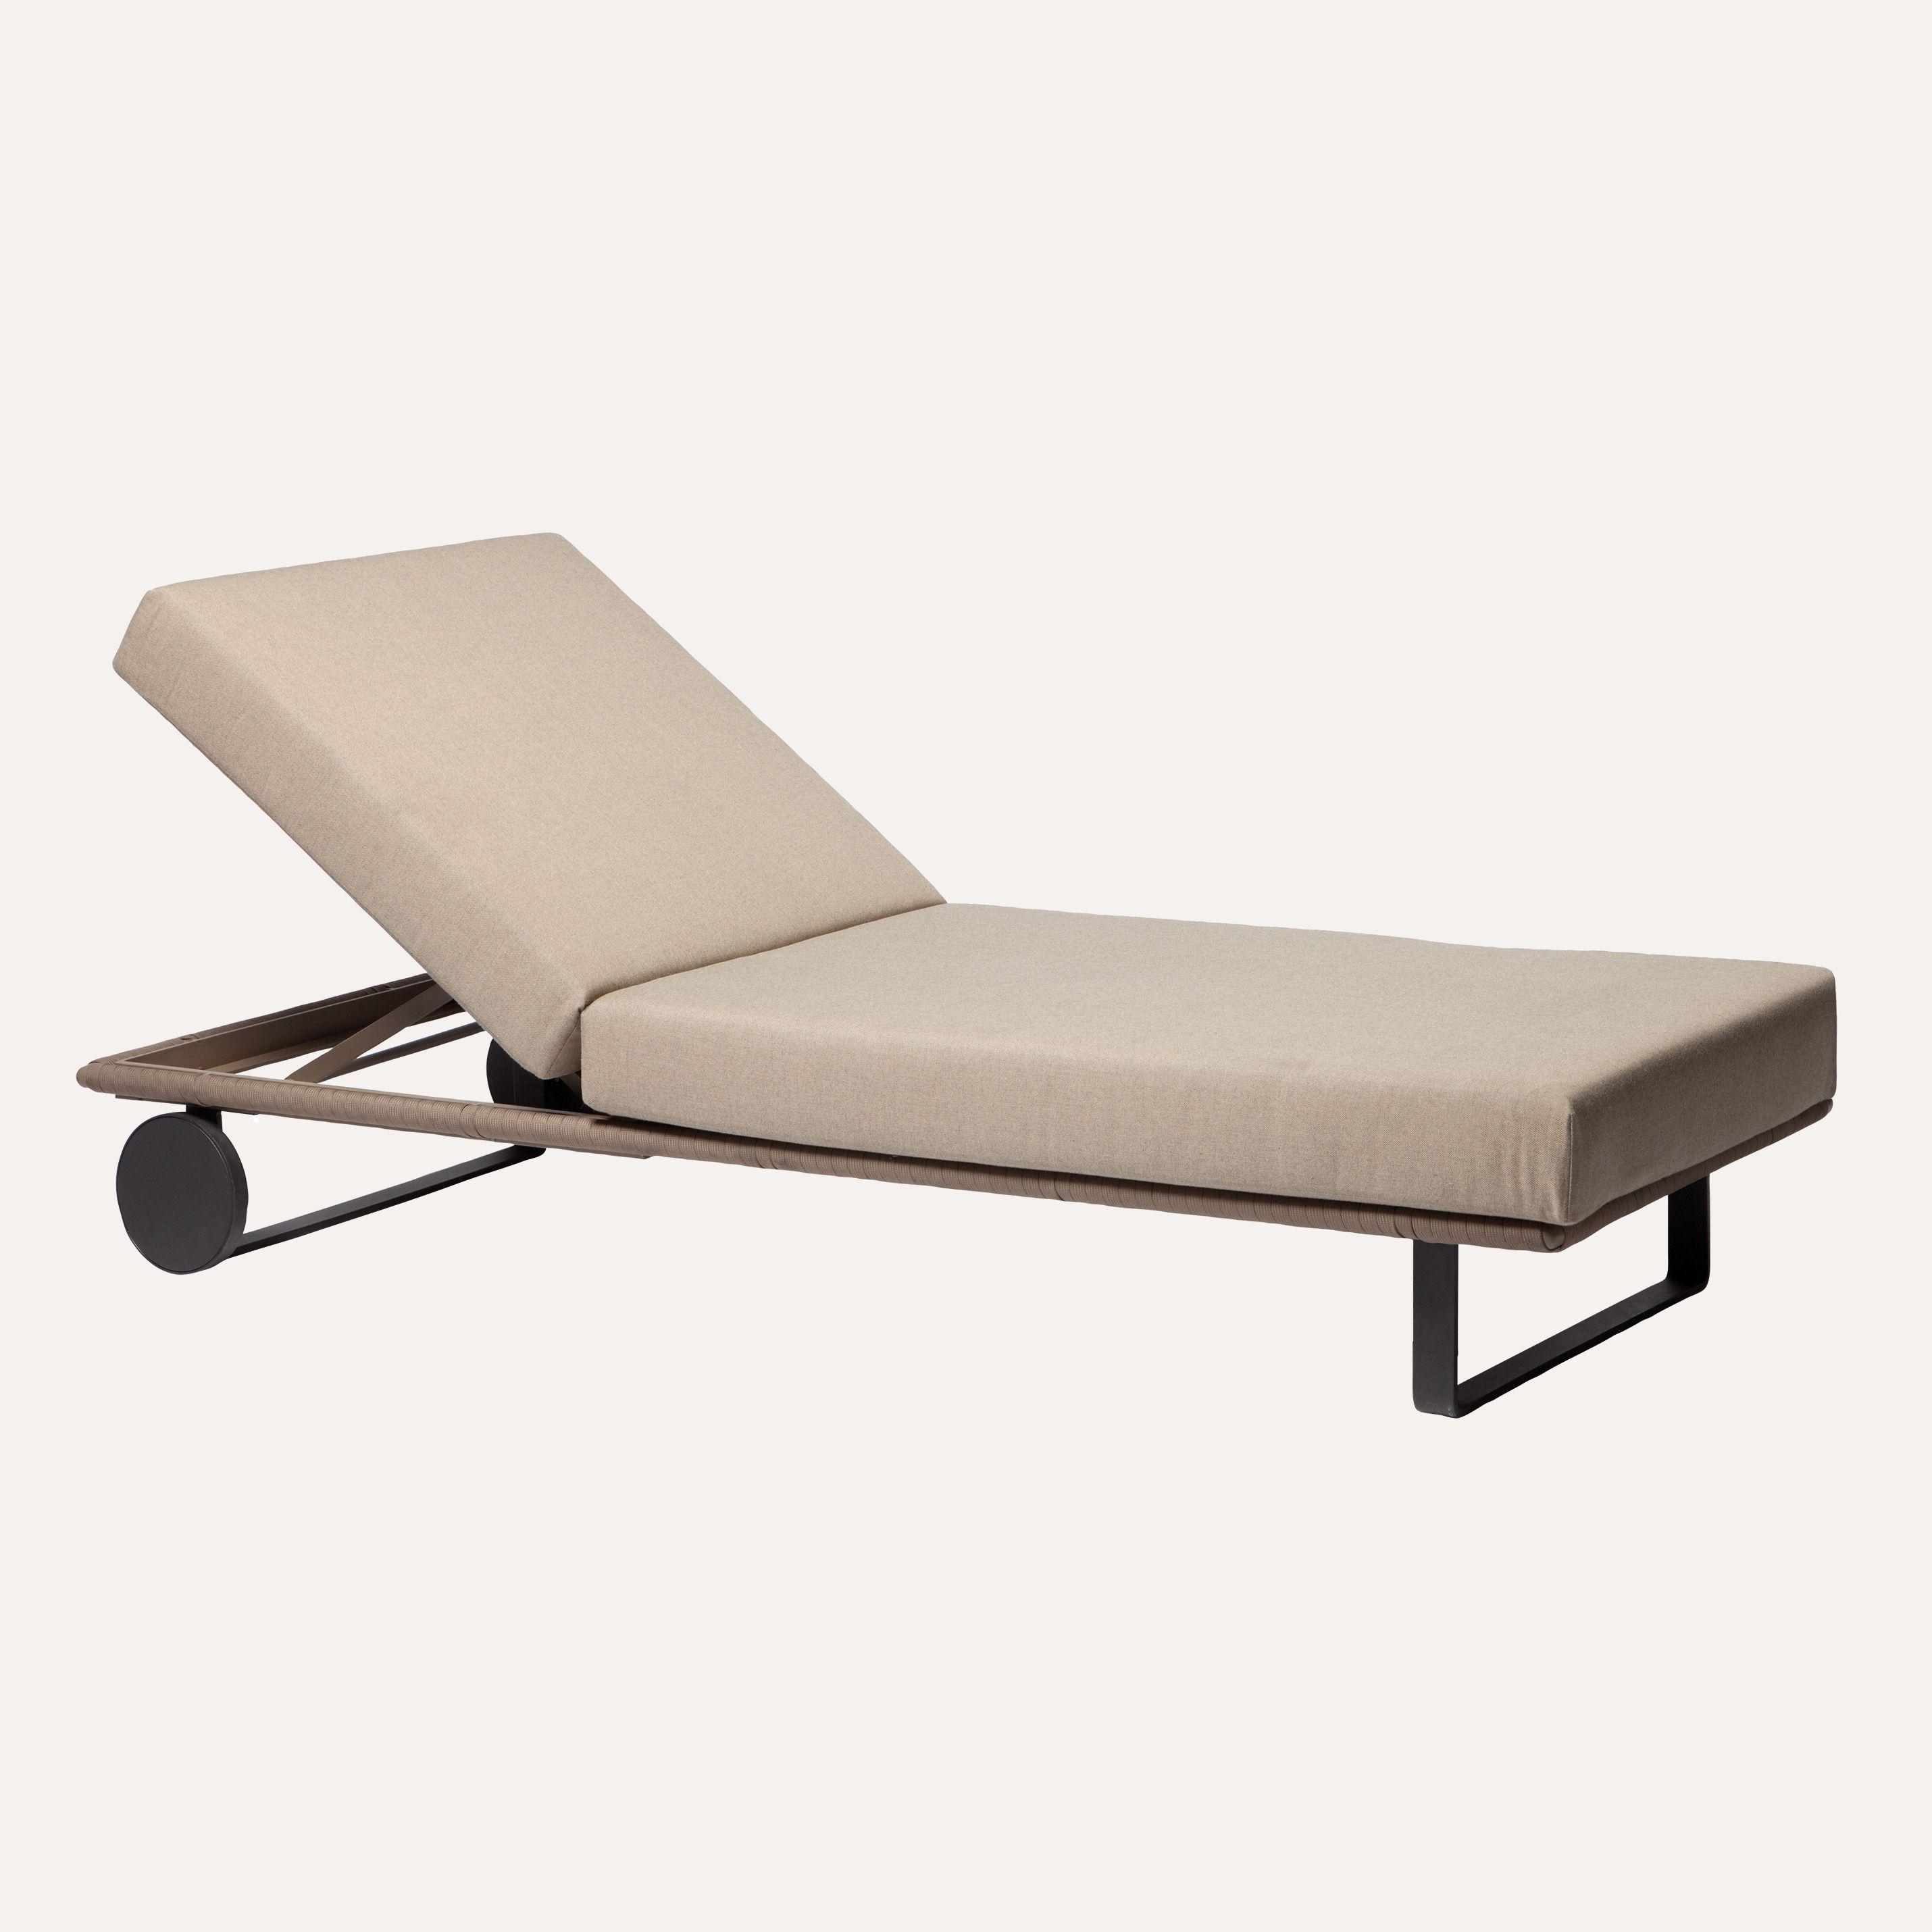 Kettal | Bitta | Tumbona | Furniture | Pinterest | Tumbonas y ...